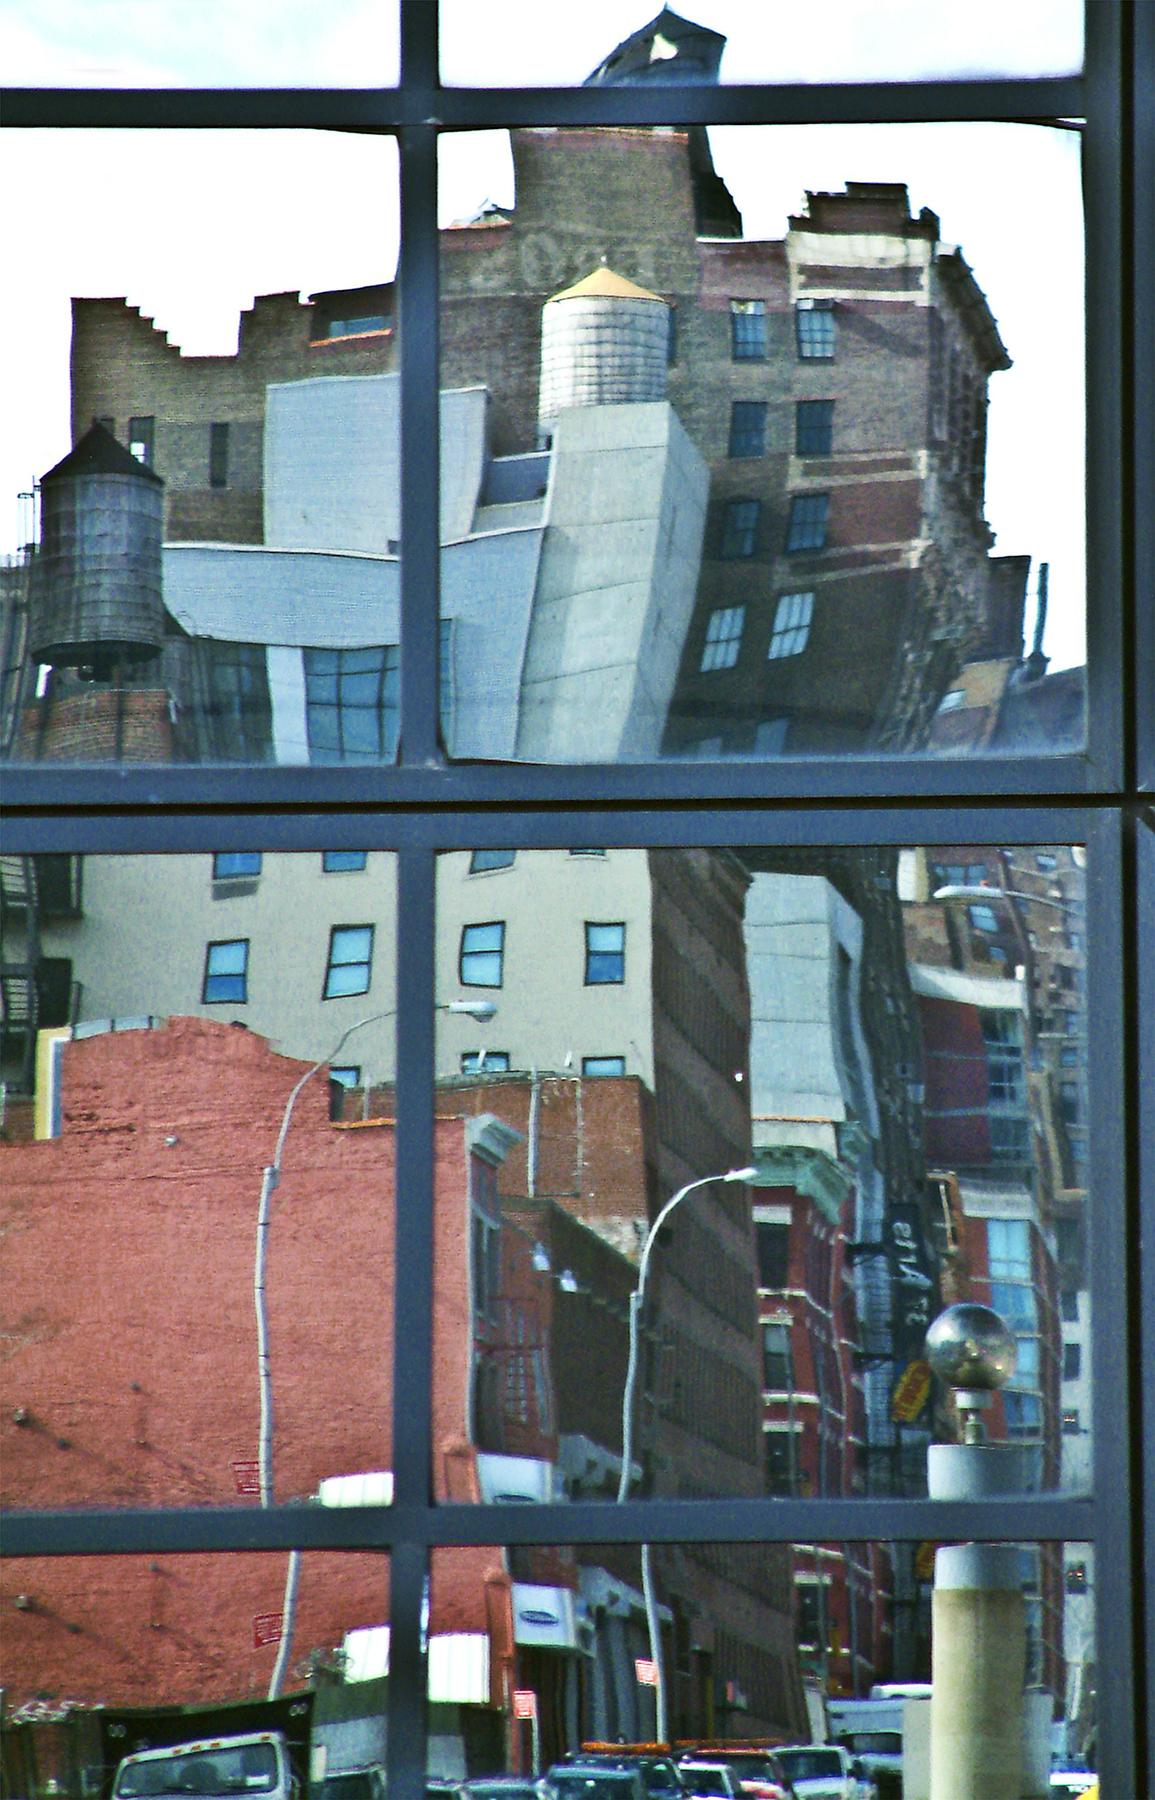 willa_davis_city-in-glass-05.jpg